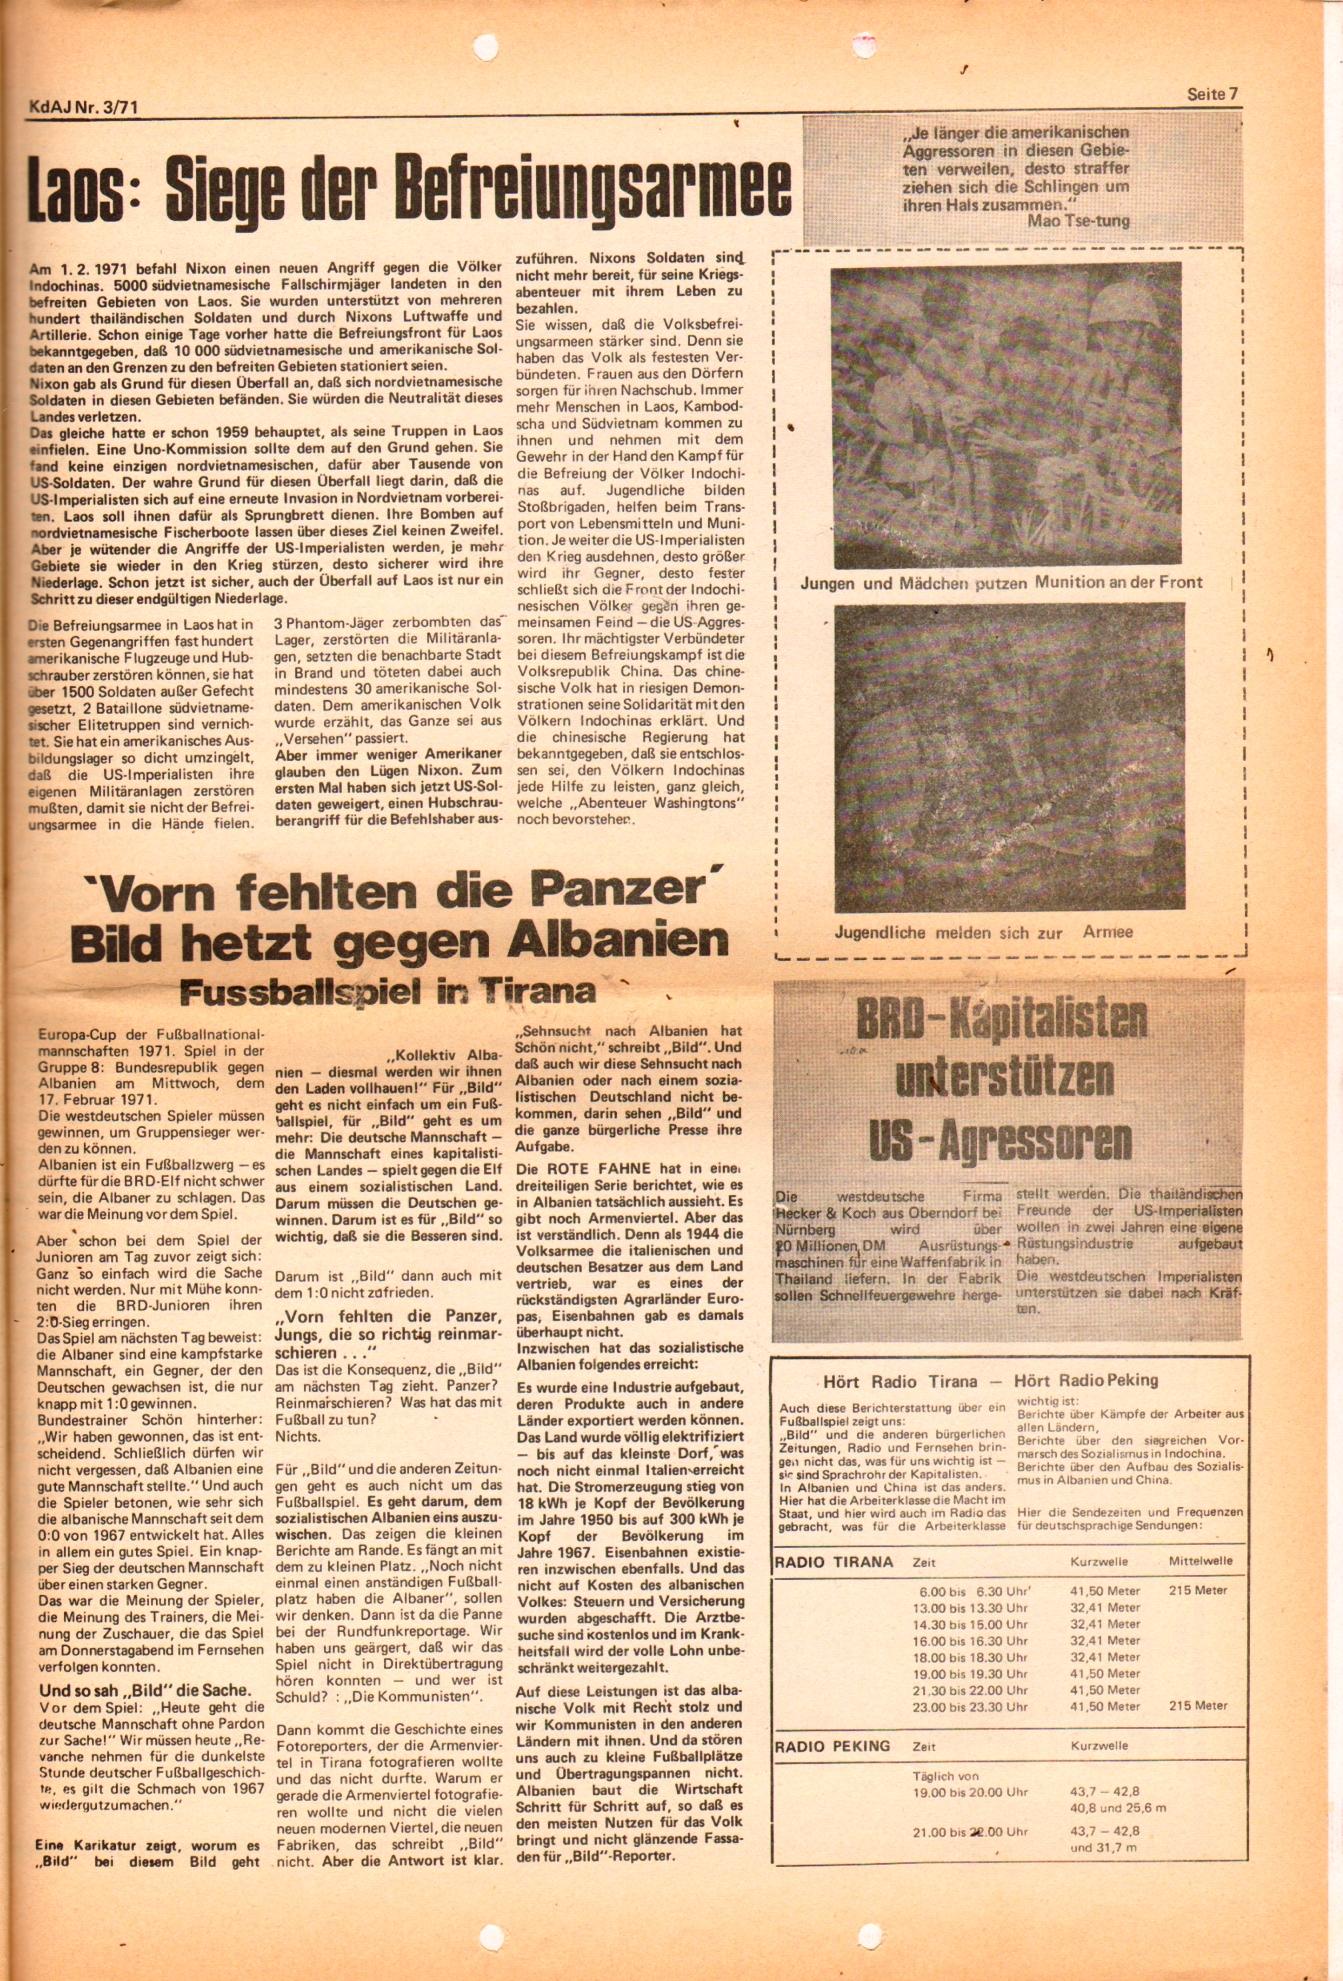 KDAJ, 2. Jg., März 1971, Nr. 3, Seite 7